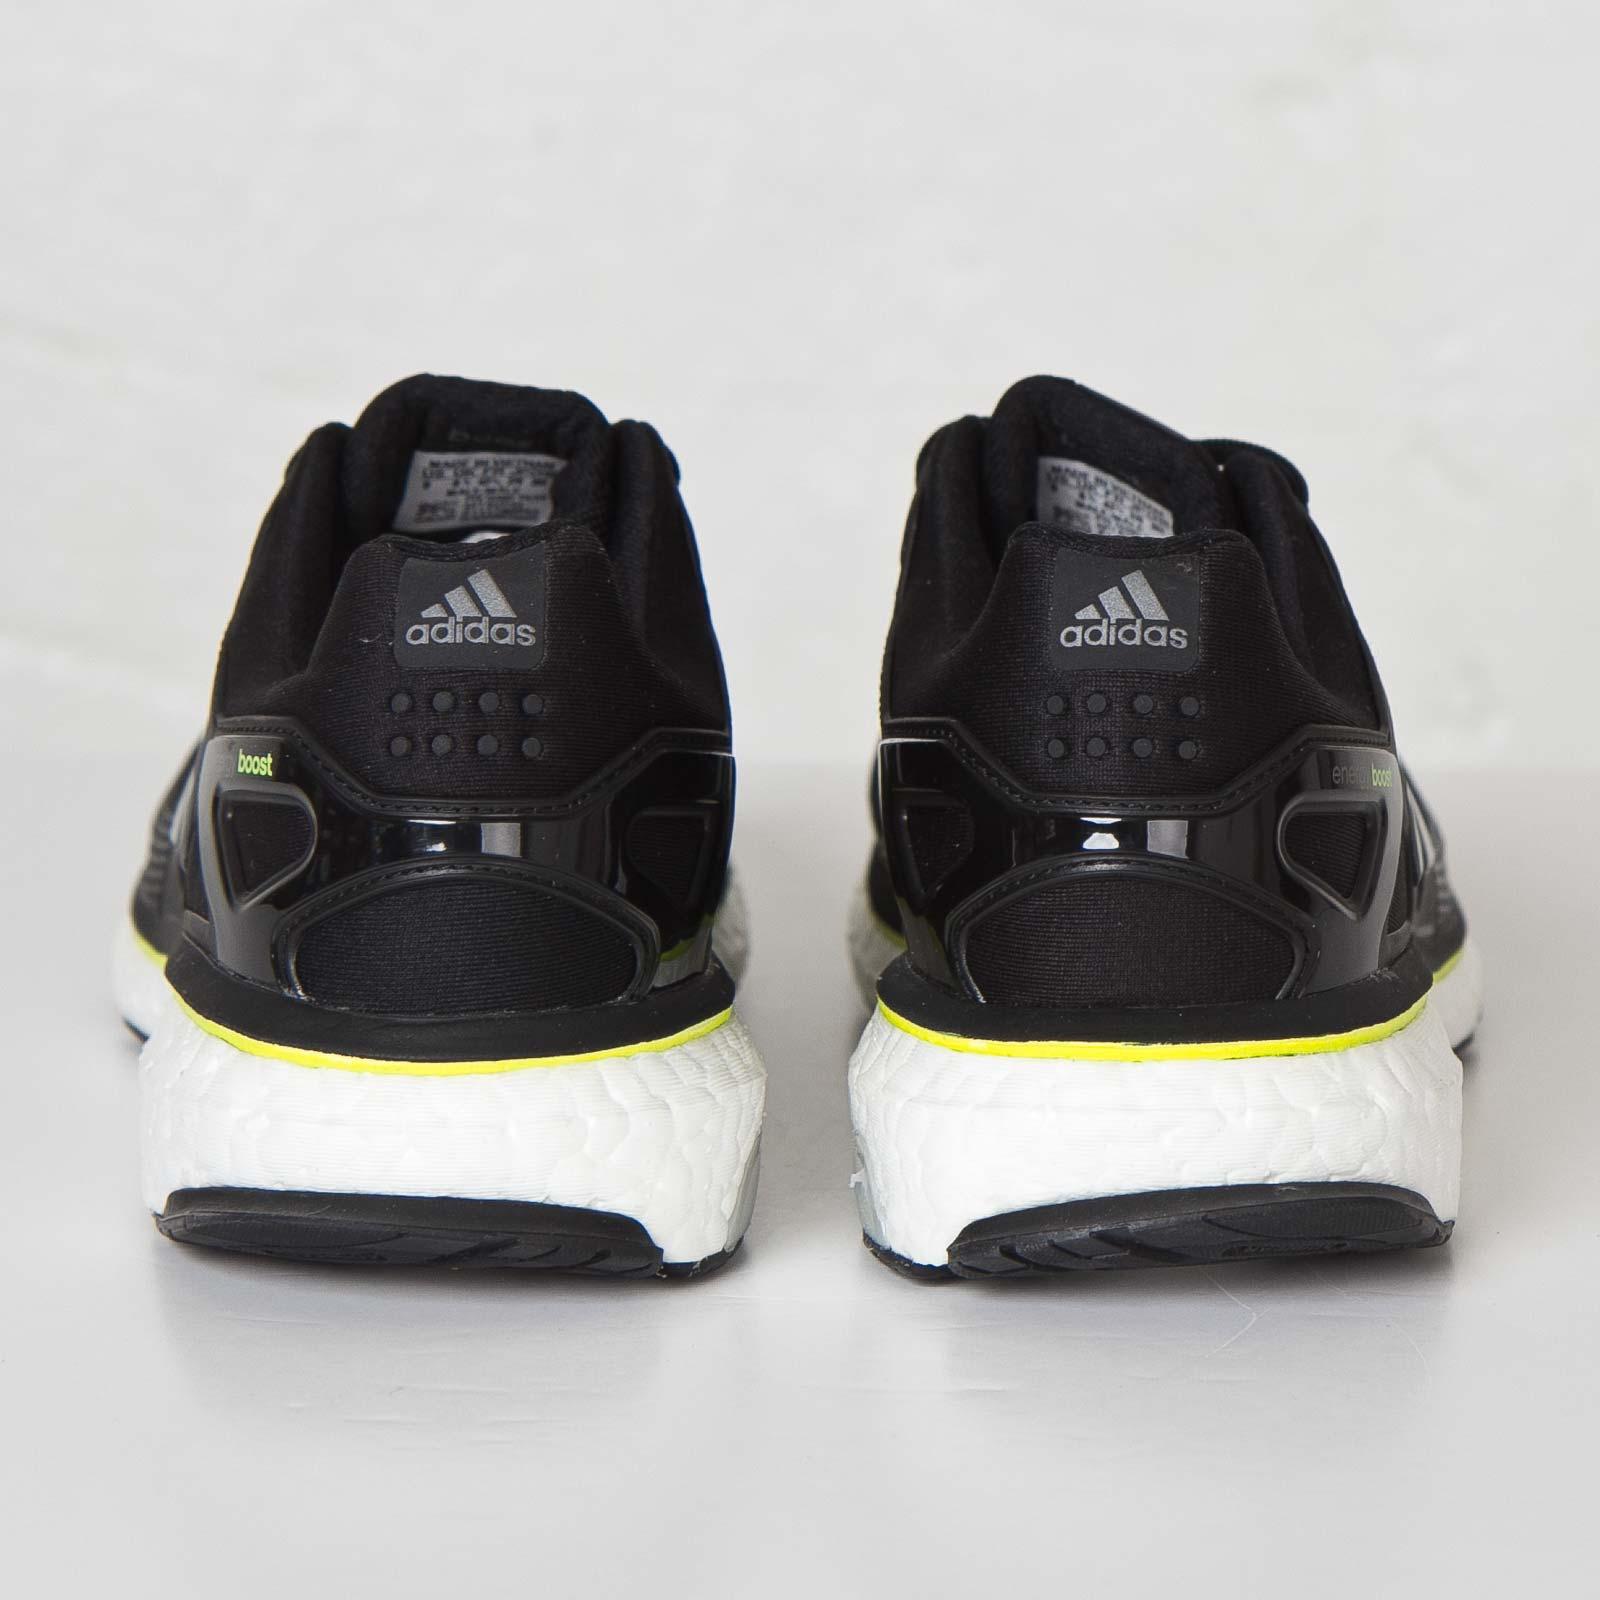 adidas energy boost ESM m - B23154 - Sneakersnstuff  aac36a6c4